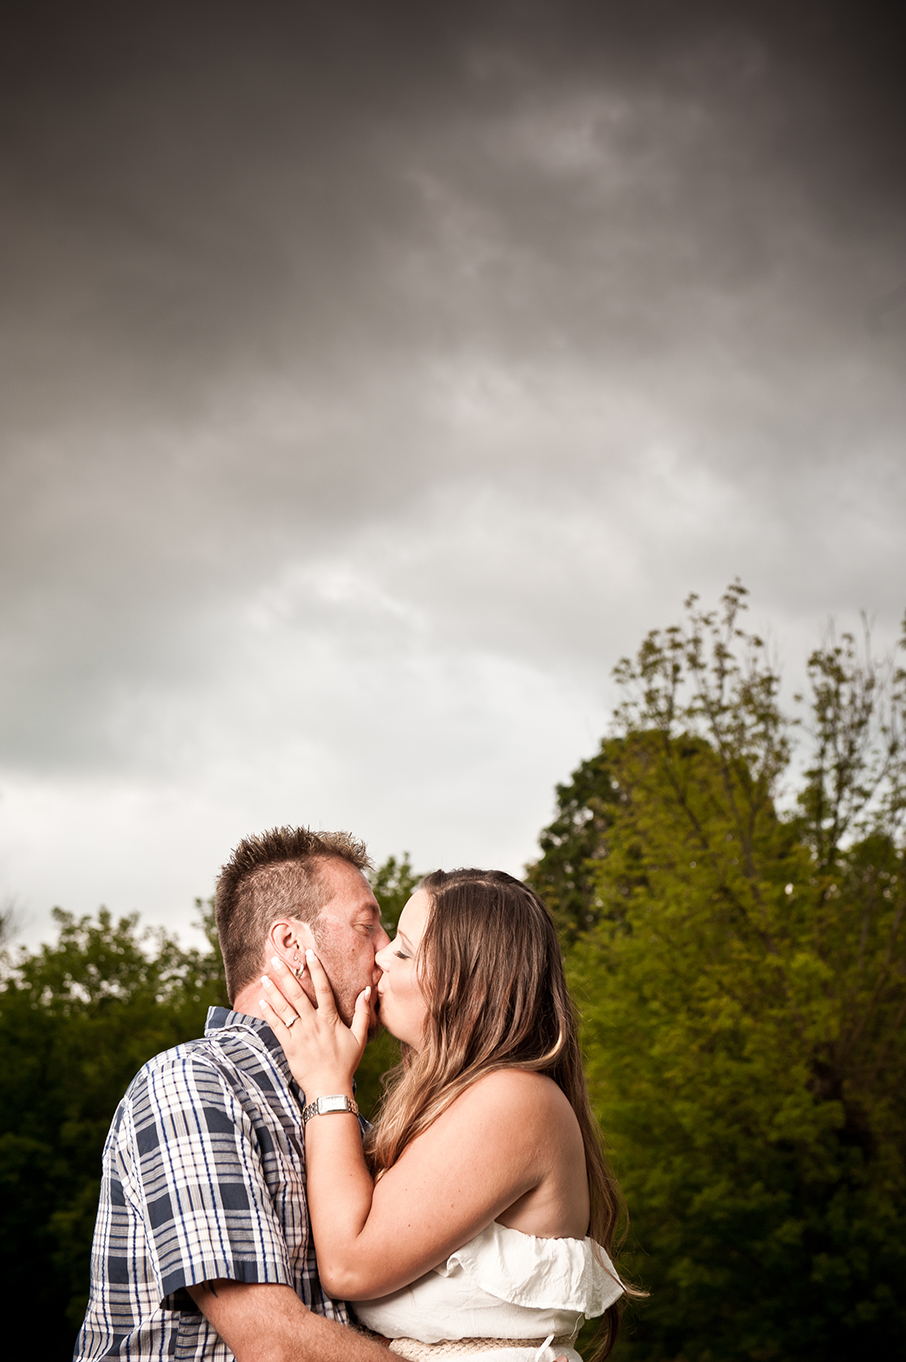 Amanda&Carlo_Engagement-195.jpg